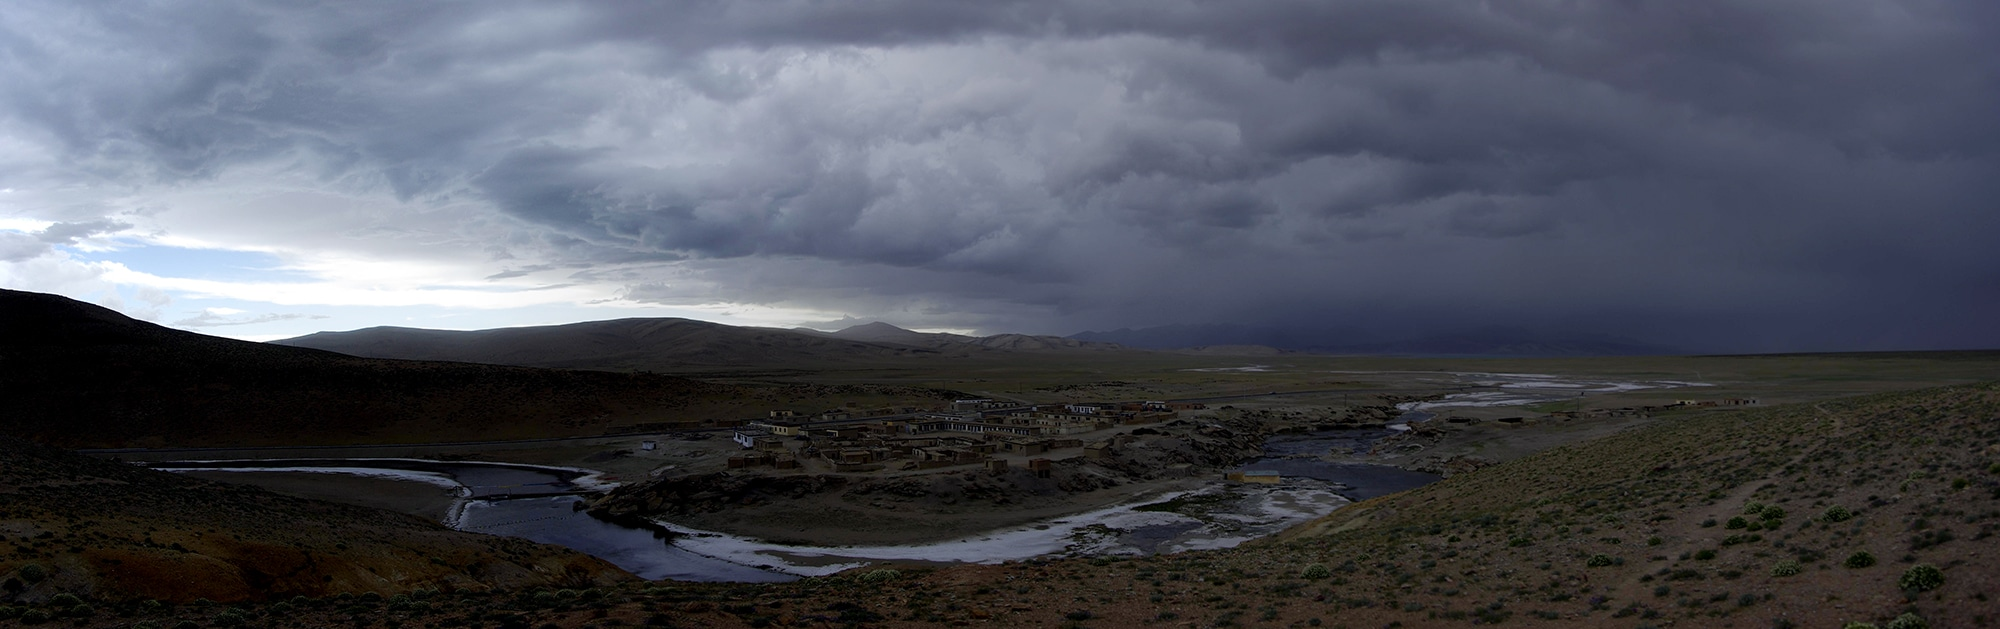 Chenal entre les lacs Manasarovar et Rakshastal. L'orage se raproche.